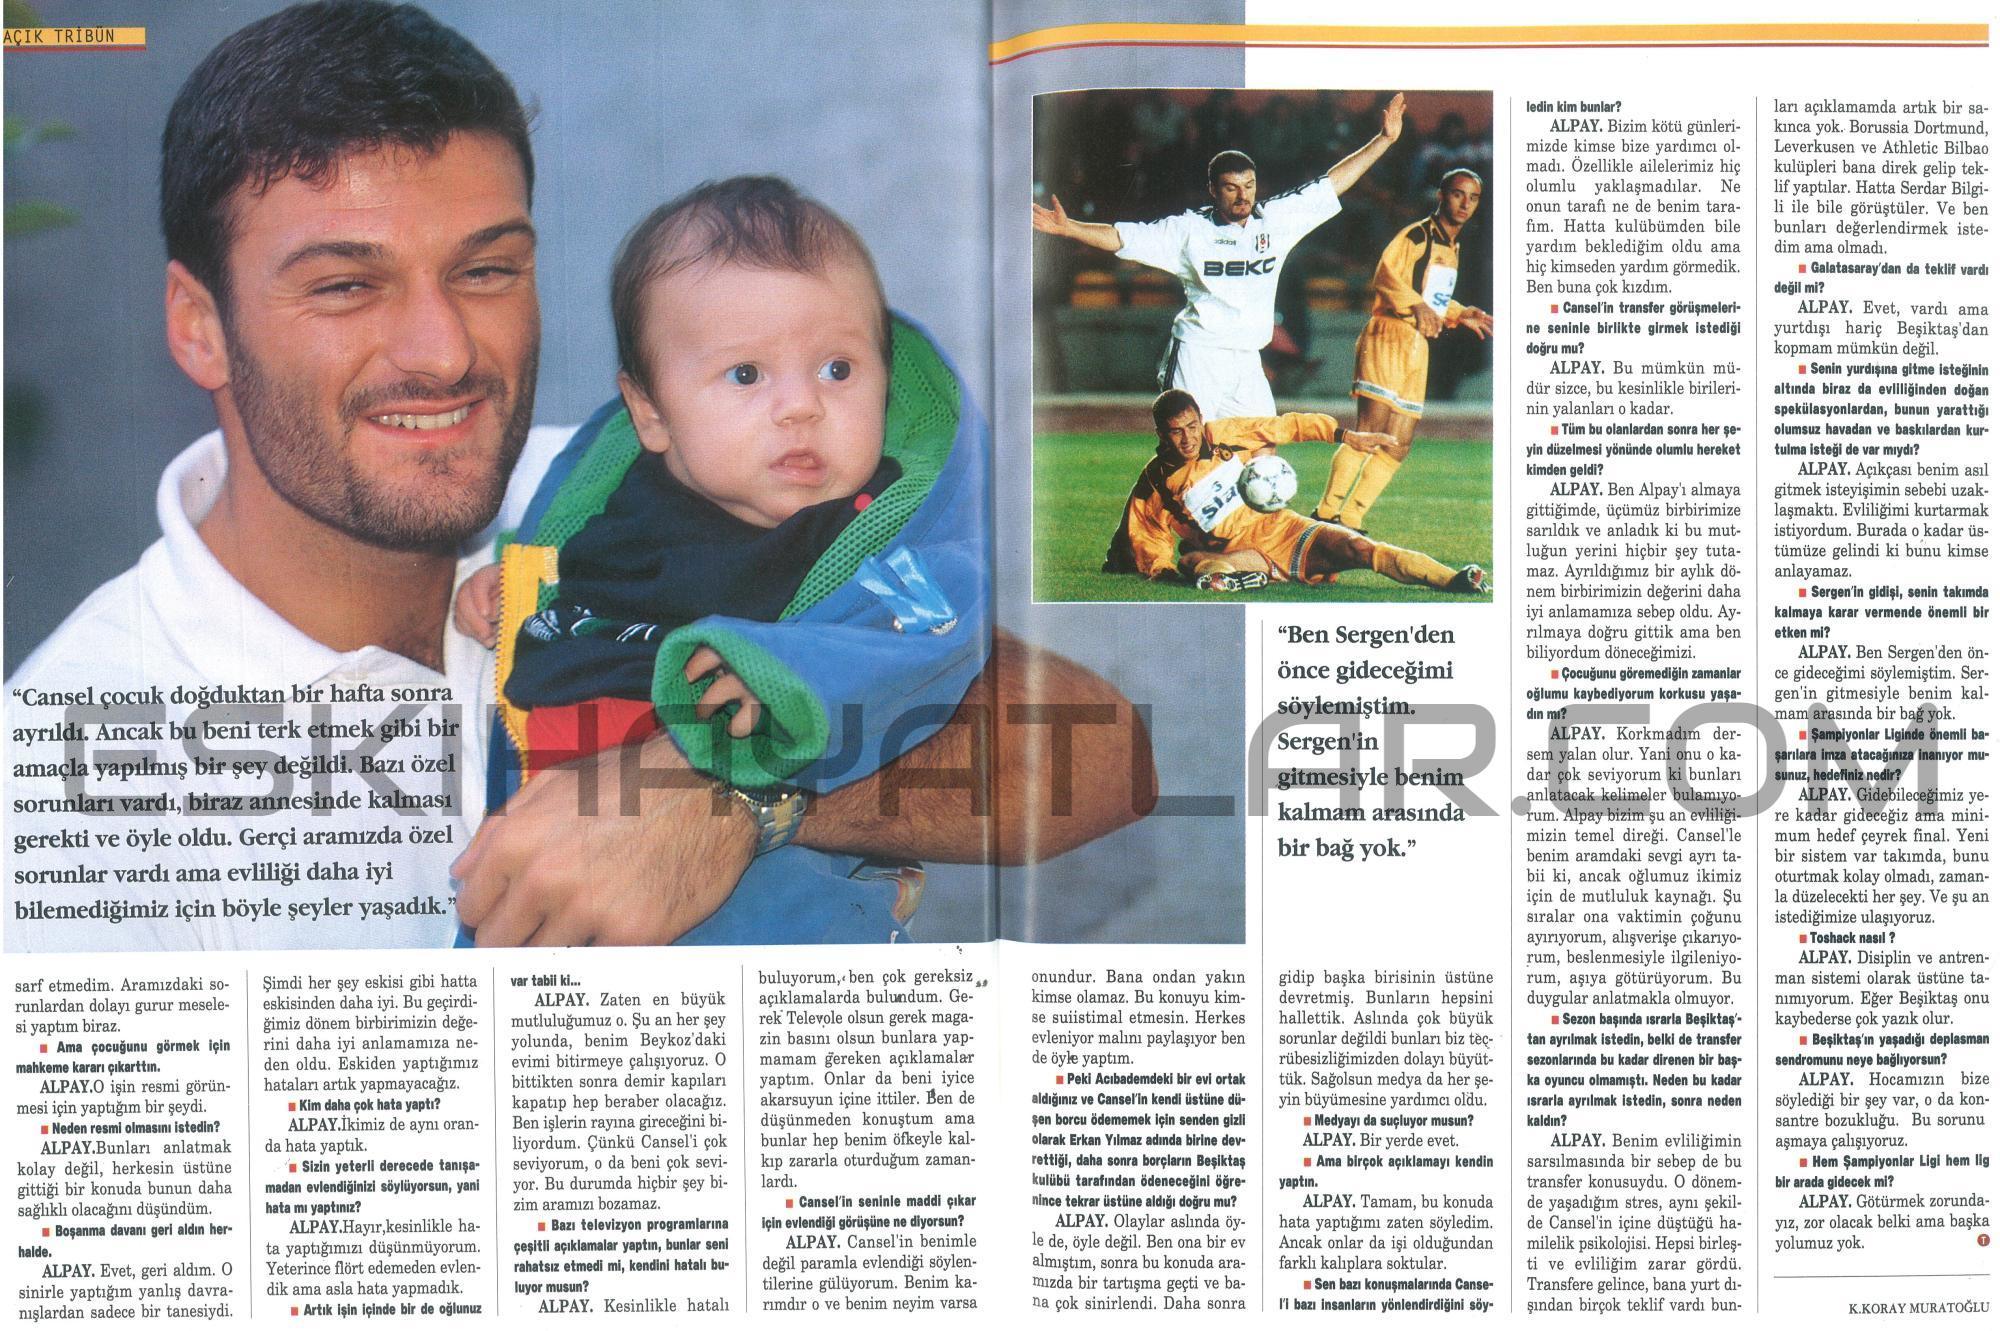 alpay-ozalan-besiktas-gunleri-1997-yili-tempo-dergisi (1)